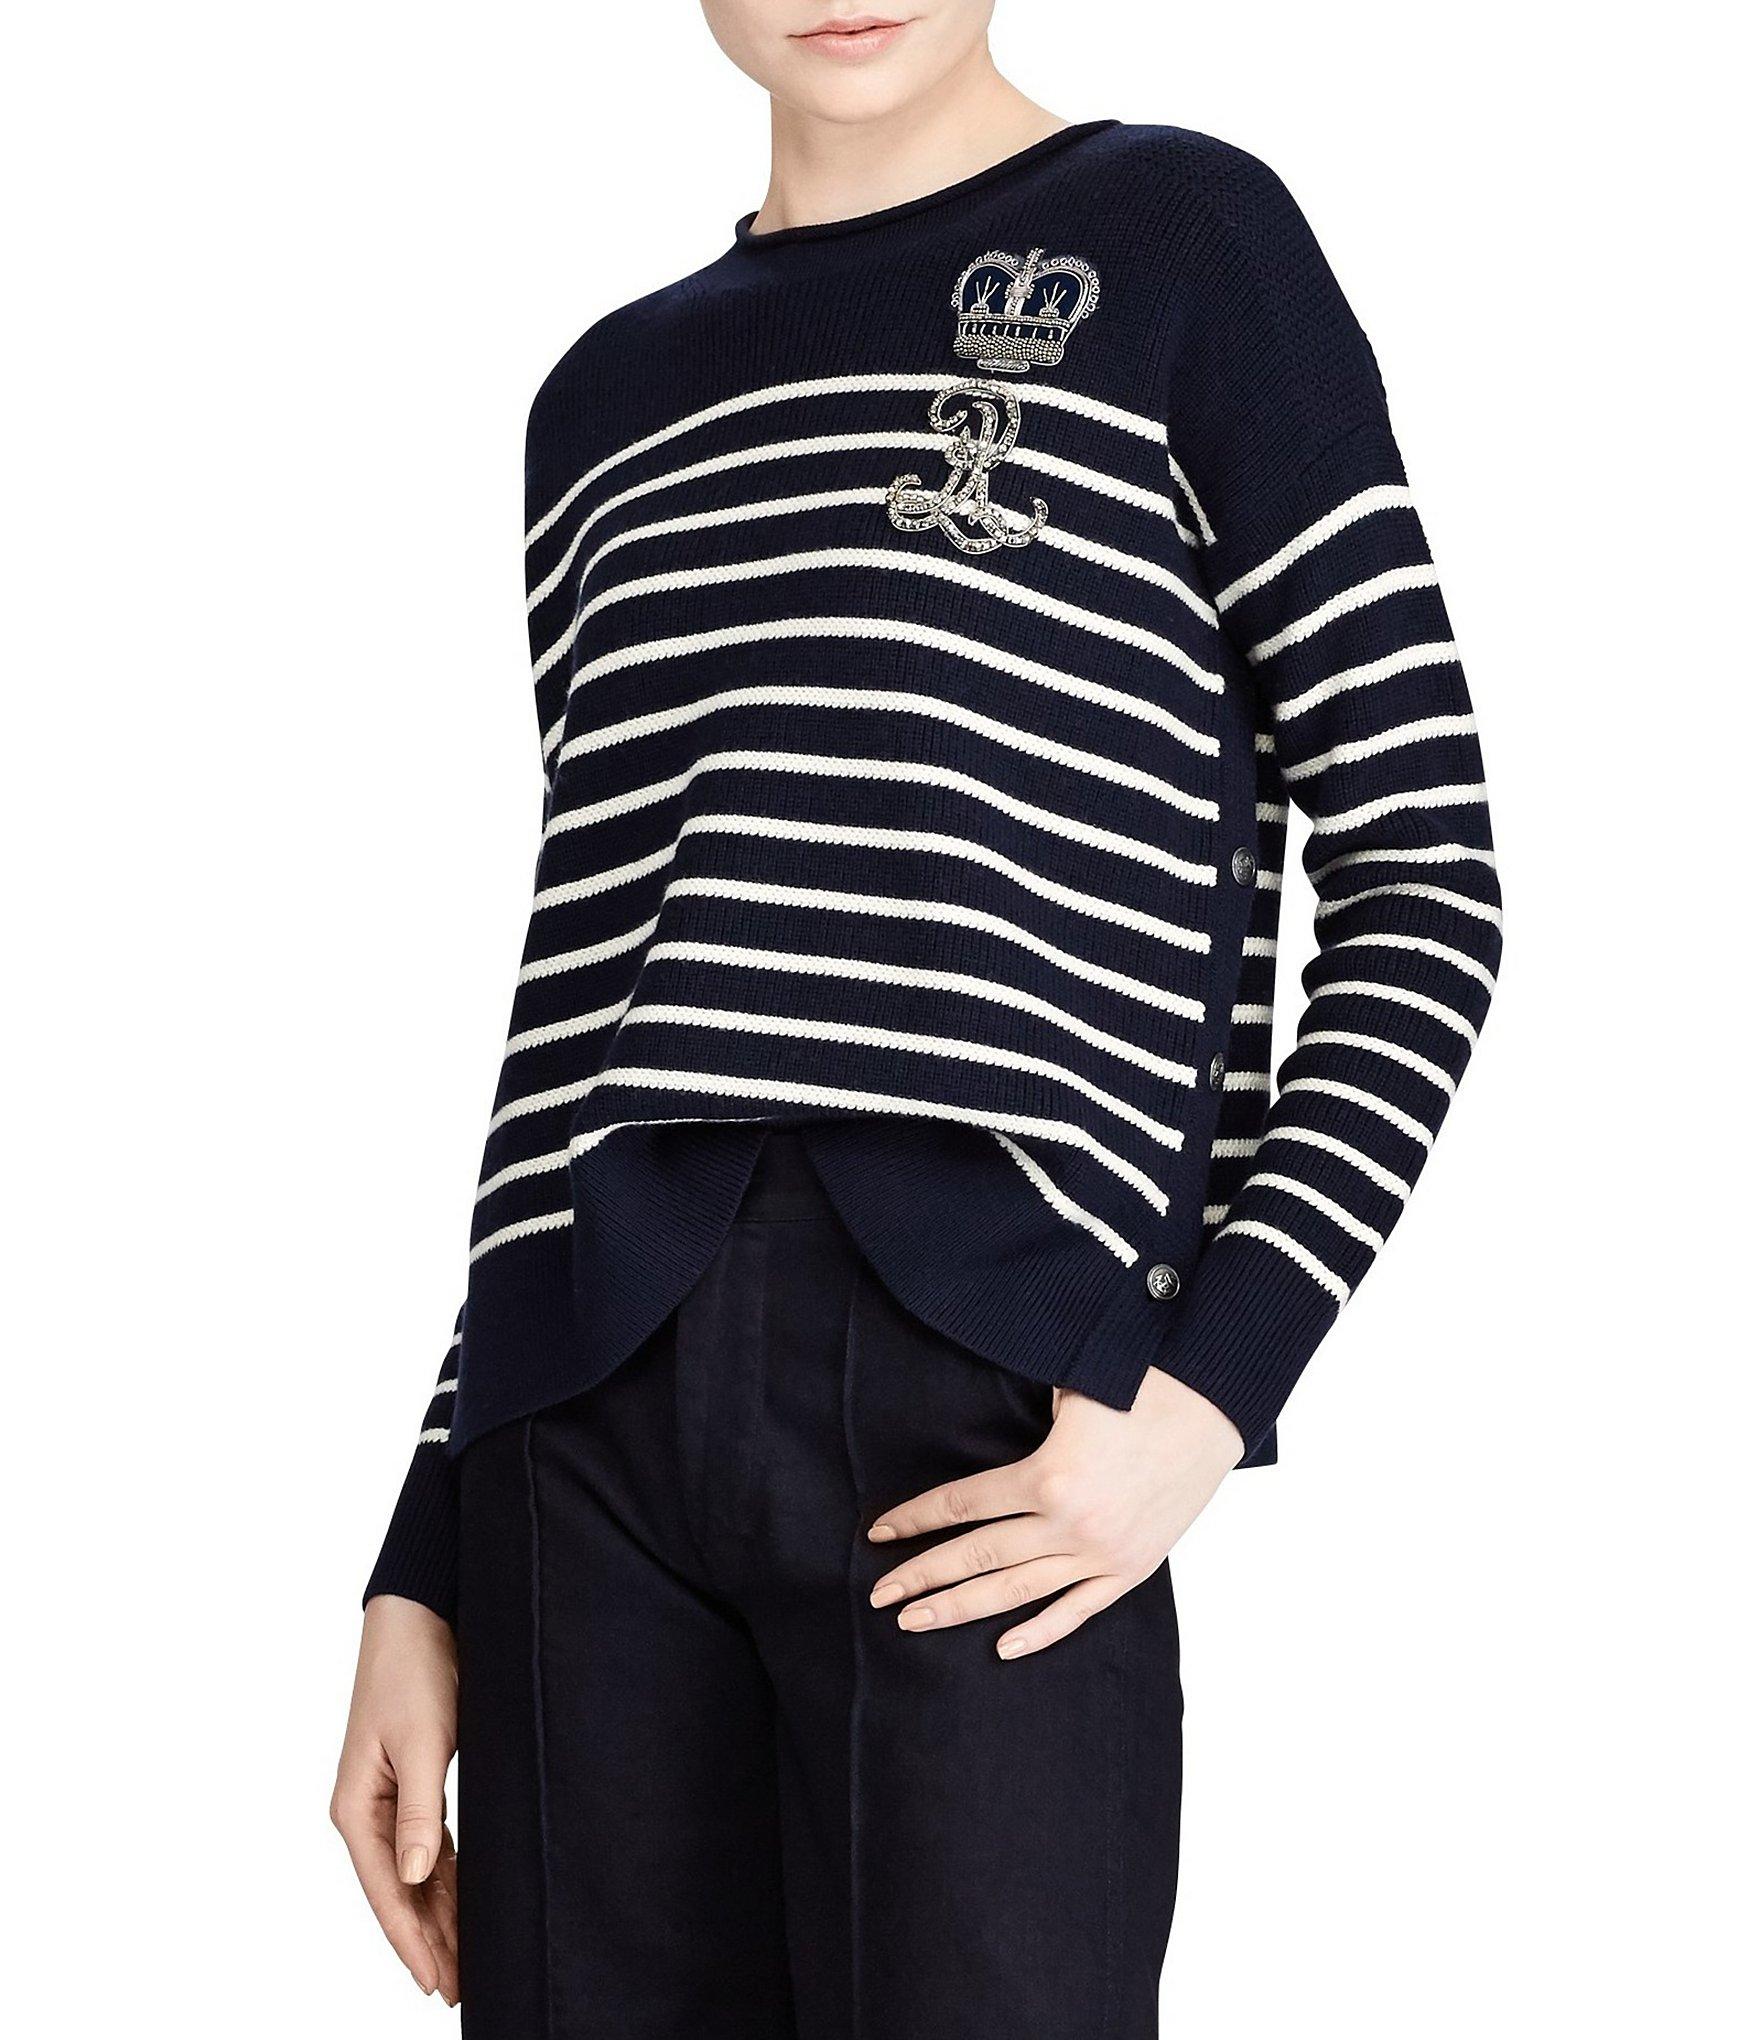 Womens Ralph Striped Shirt Tx T Lauren Outlet Houston Store mwOvN80n